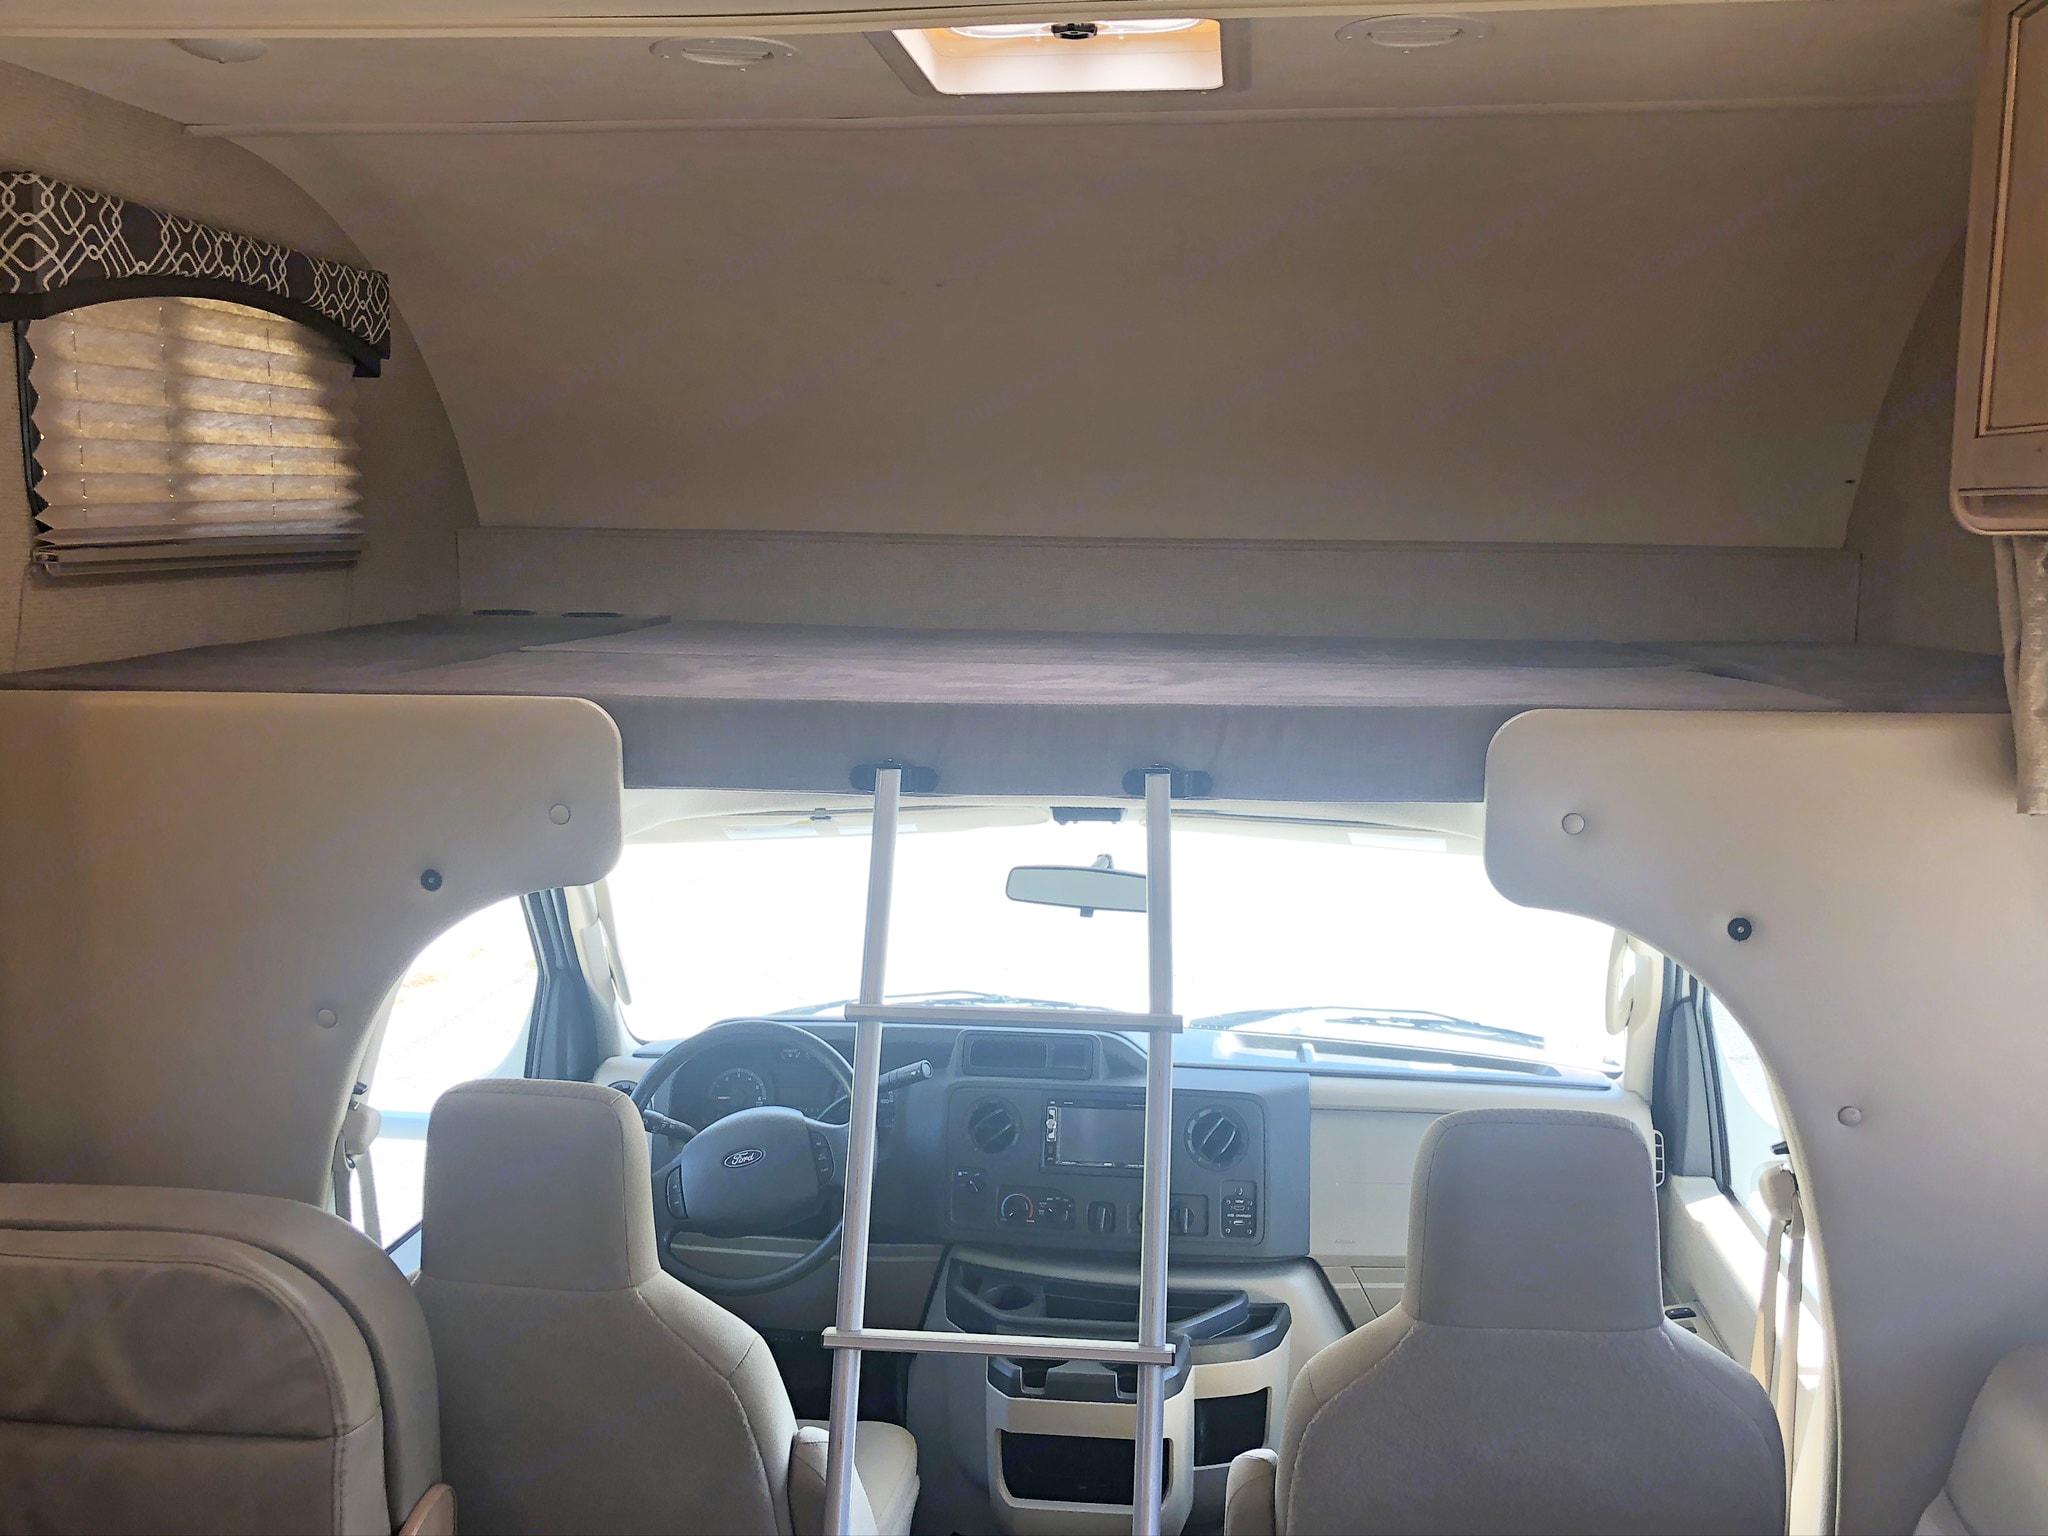 Cab-over bunk. Thor Motor Coach Chateau 2019